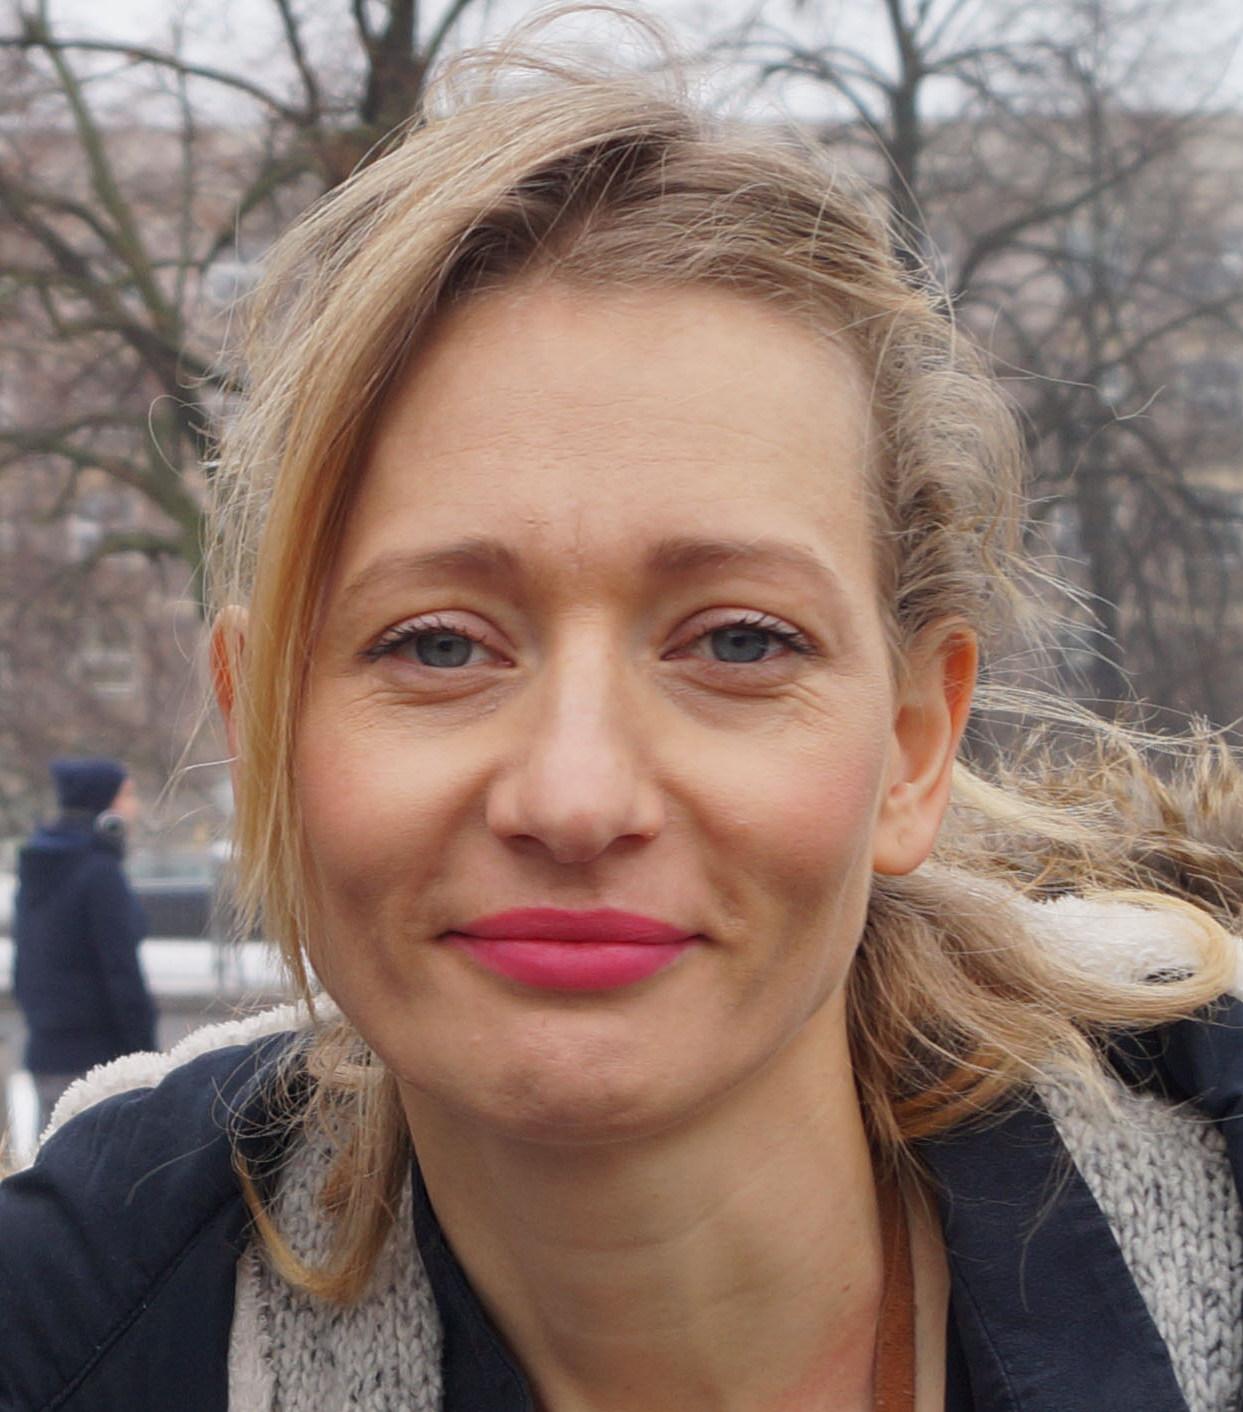 Magdalena popawska wikipedia wolna encyklopedia magdalena popawska 2017 thecheapjerseys Images